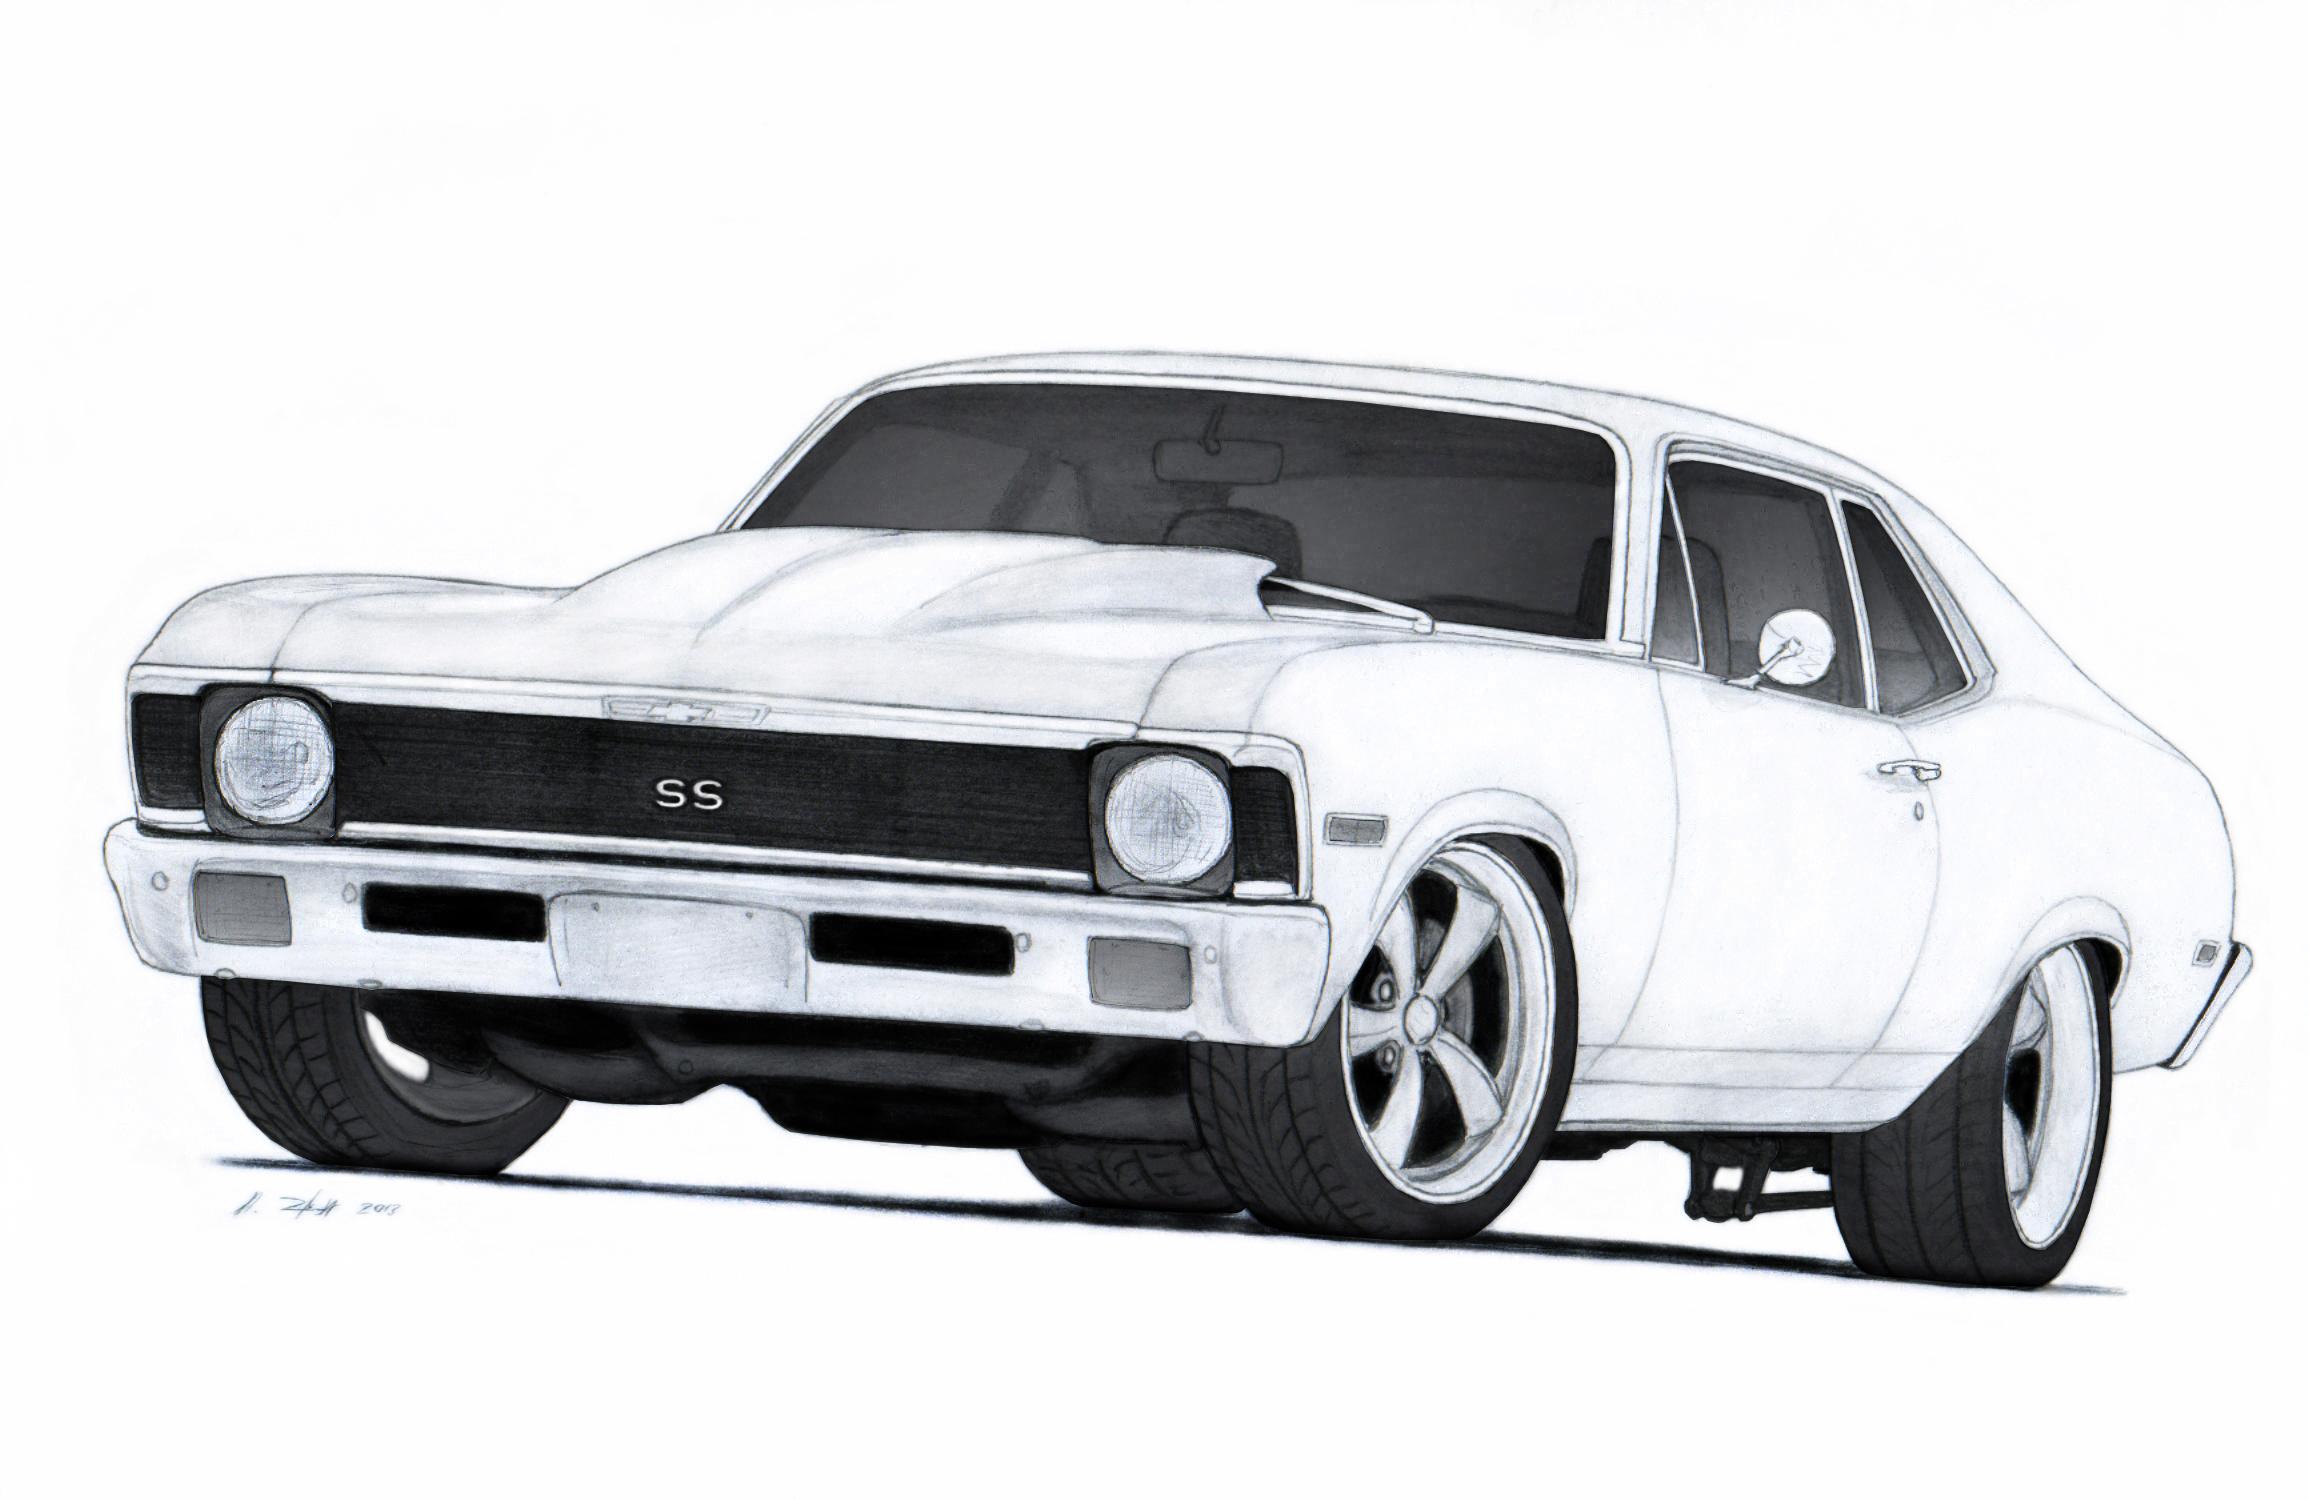 1972 Chevrolet Nova Ss Pro Touring Drawing By